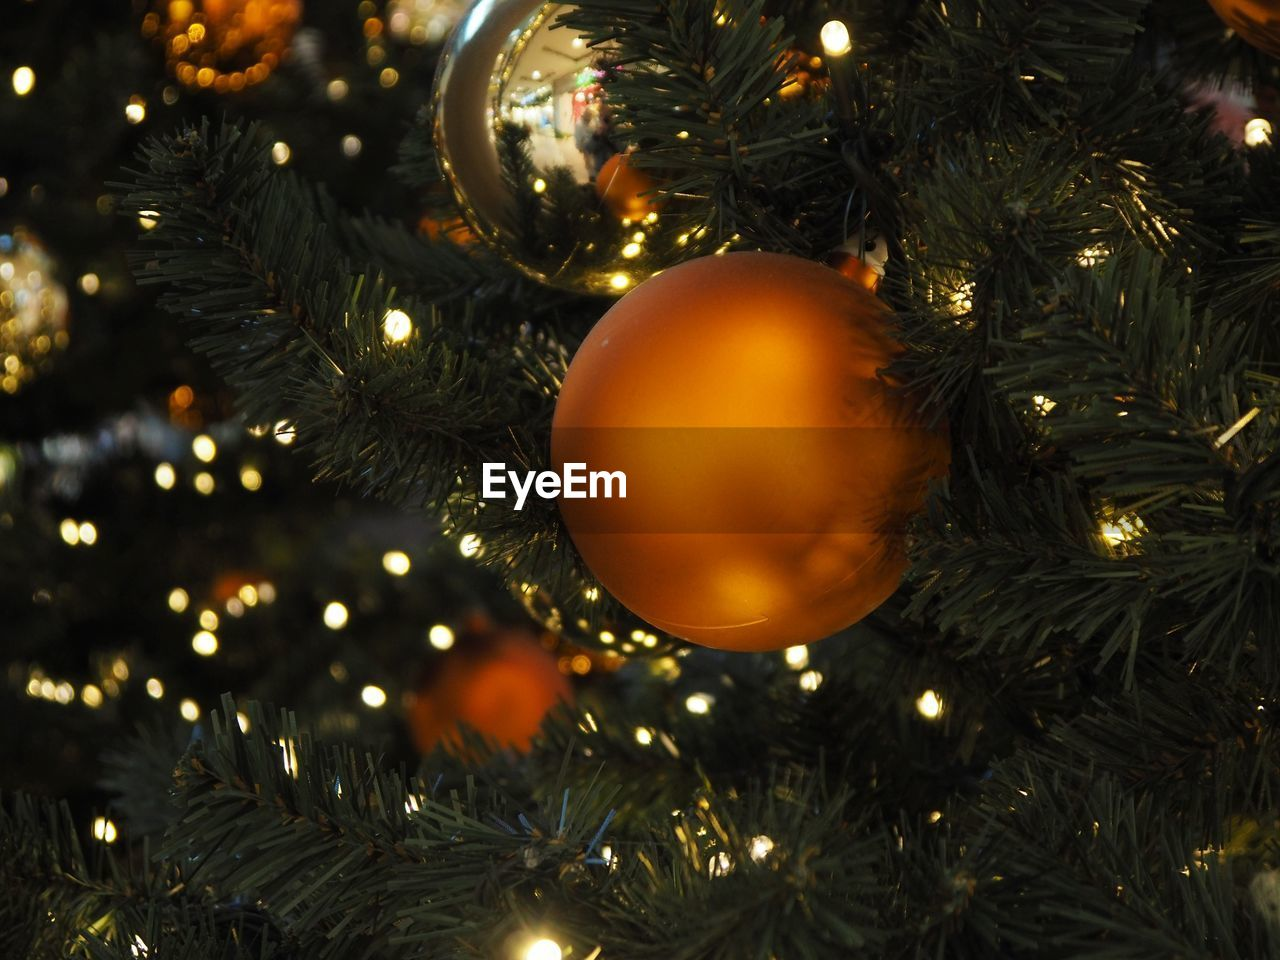 christmas, christmas decoration, christmas tree, celebration, holiday, decoration, christmas ornament, tree, illuminated, christmas lights, close-up, no people, celebration event, indoors, holiday - event, sphere, event, selective focus